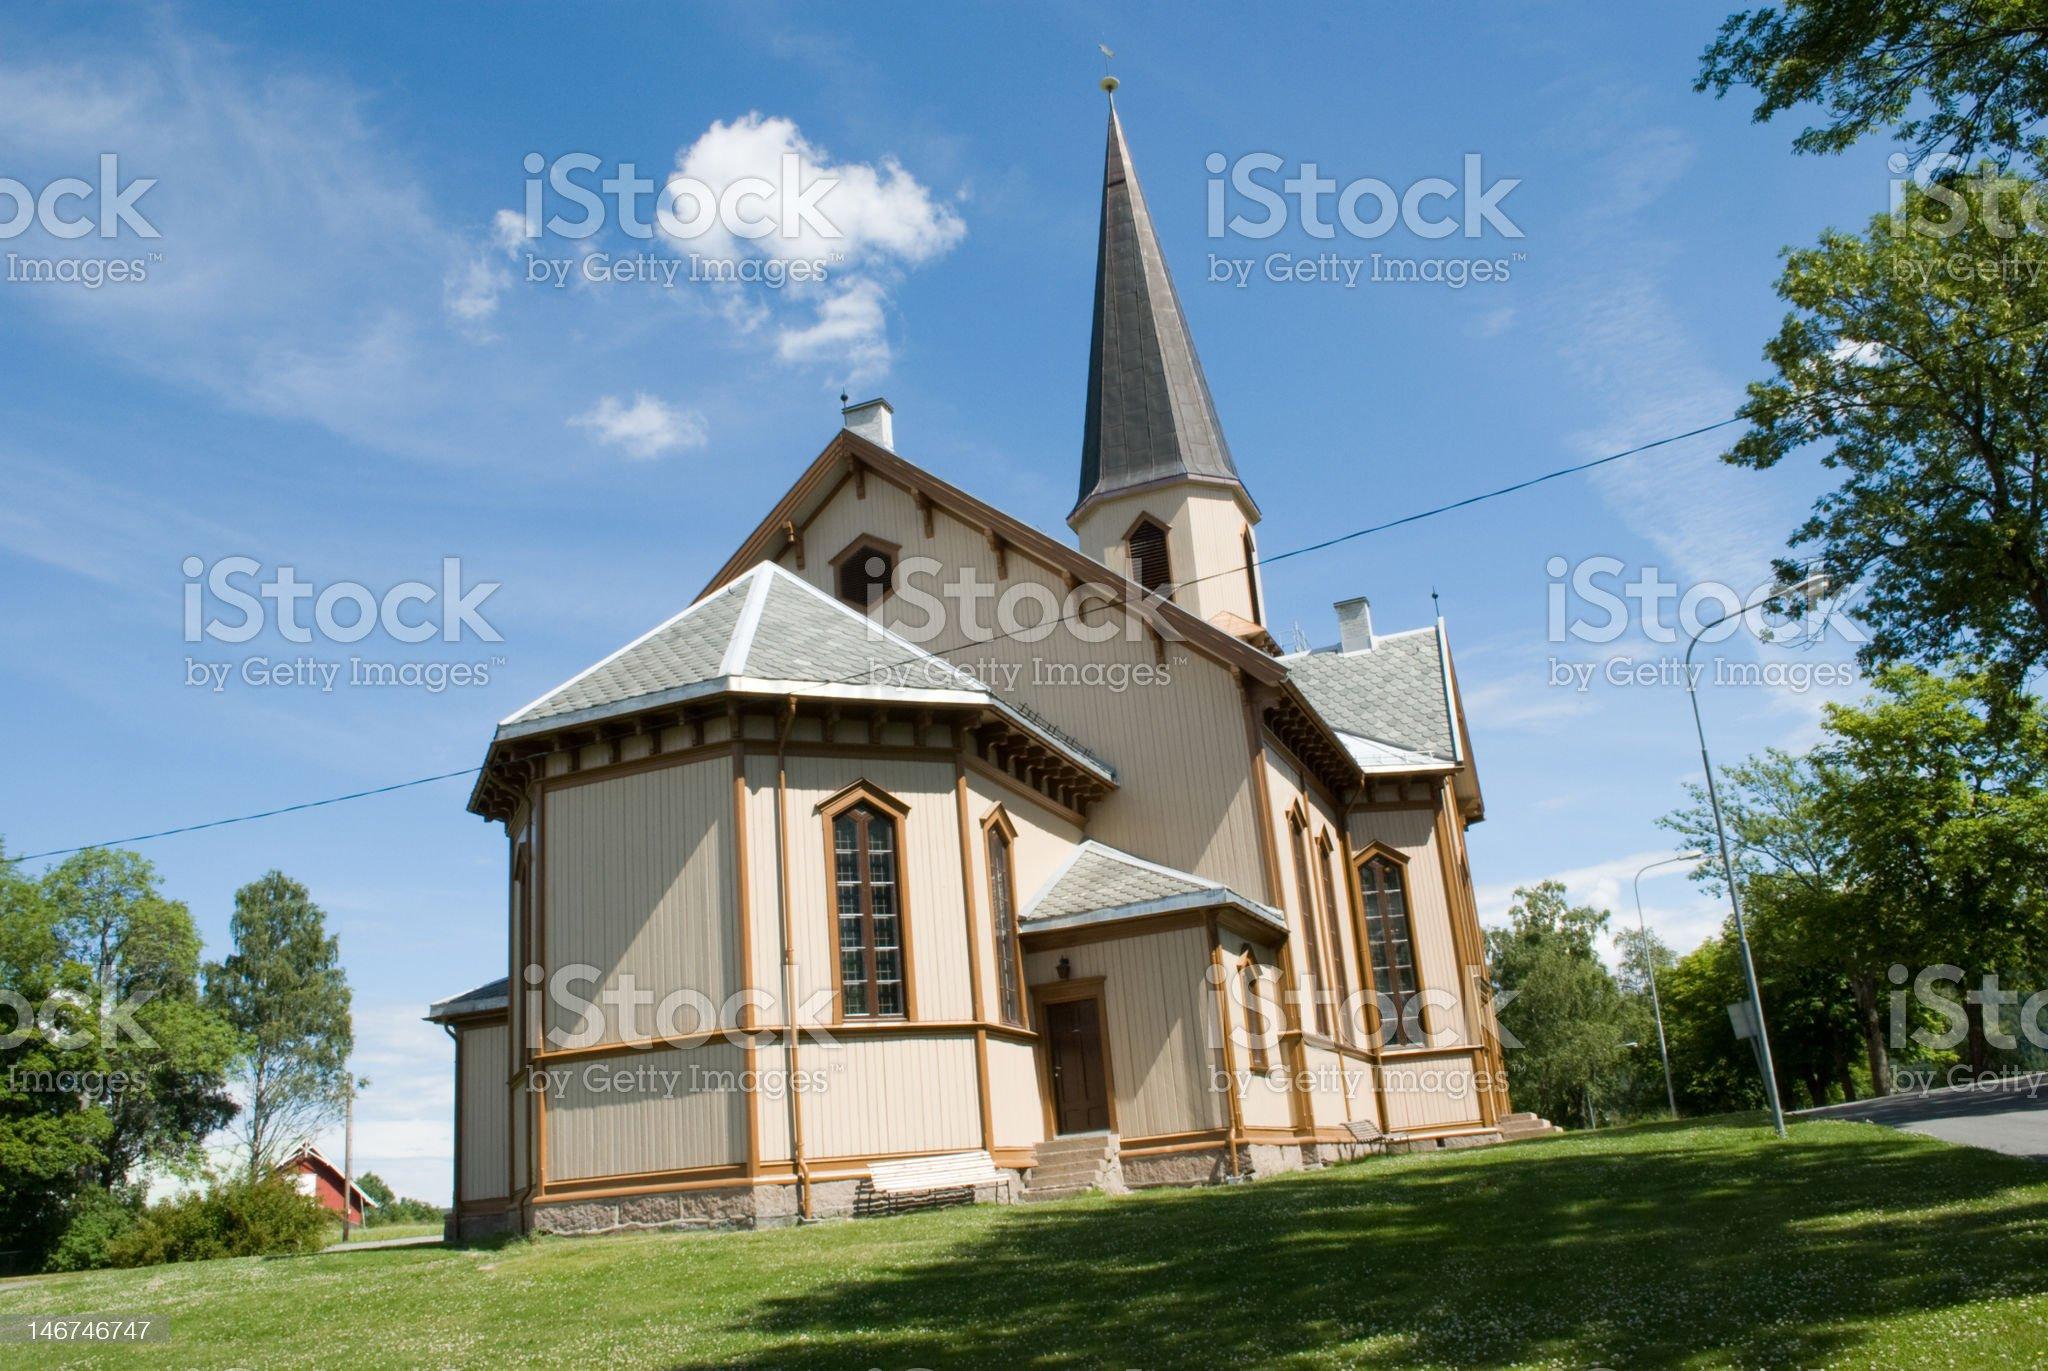 Fetsund church royalty-free stock photo